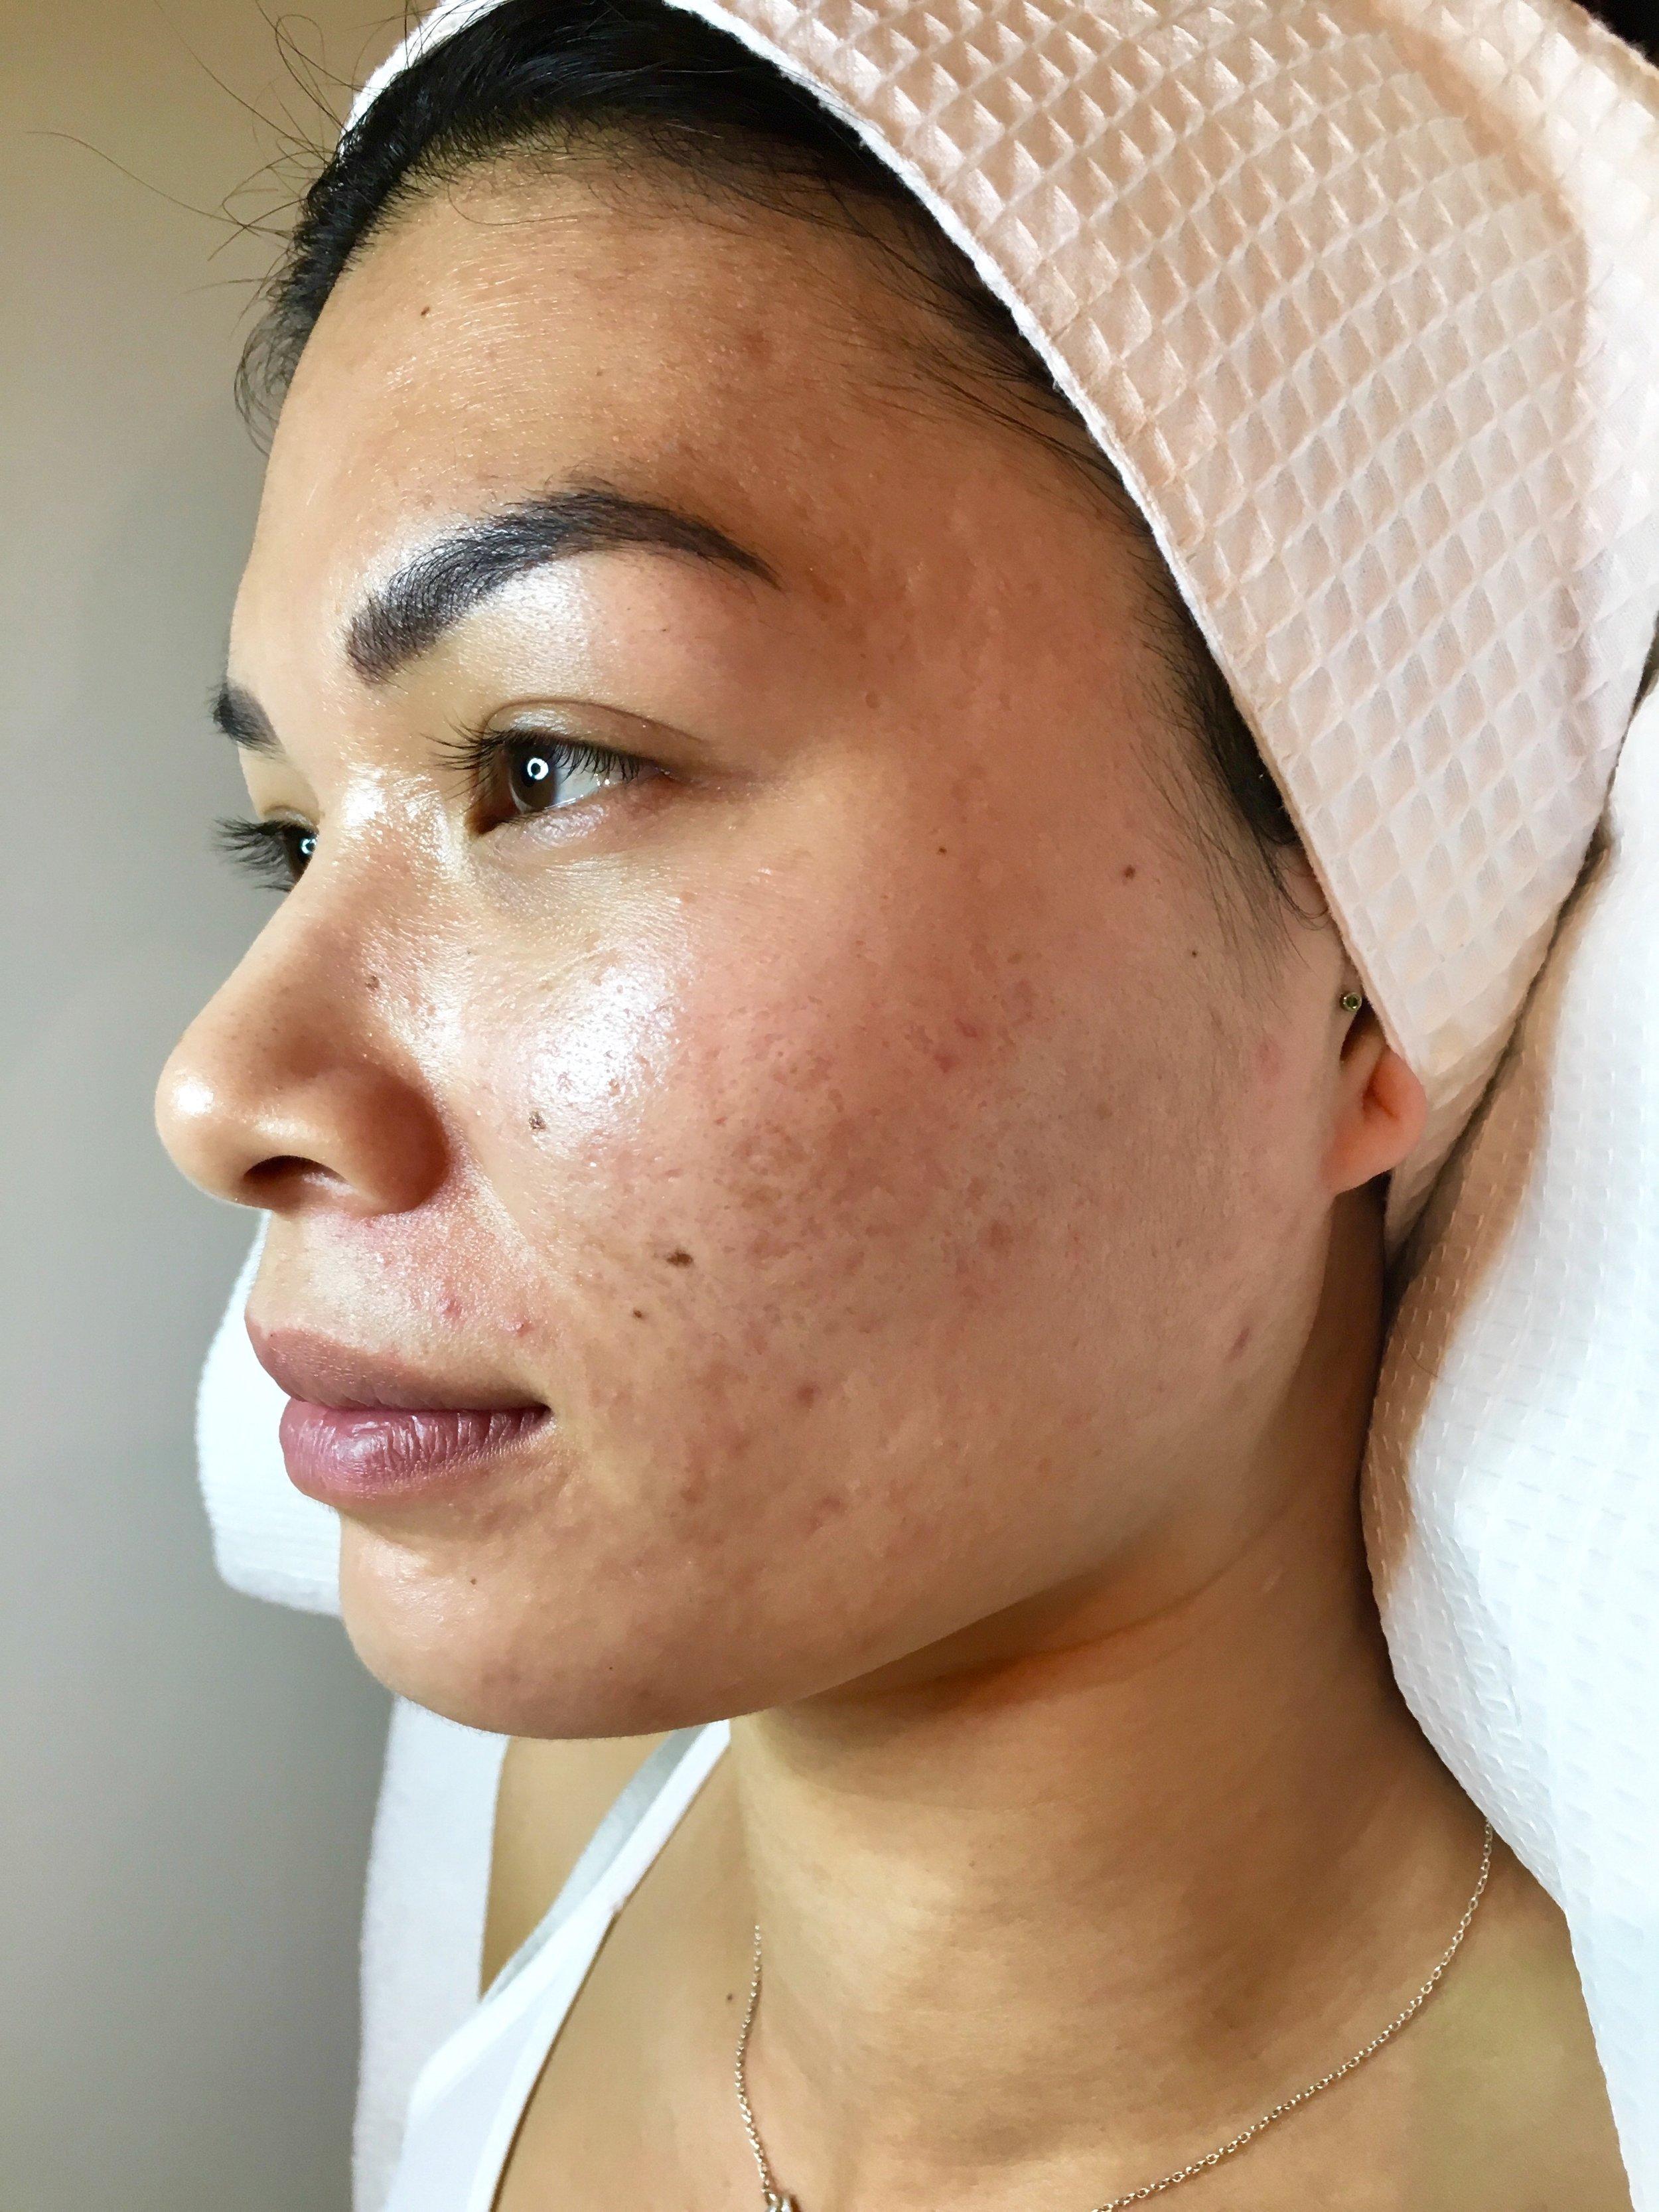 dermaviduals melbourne dmk enzyme therapy melbourne dmk enzyme treatment melbourne acne scaring. skin needling. skin clinic melbourne.